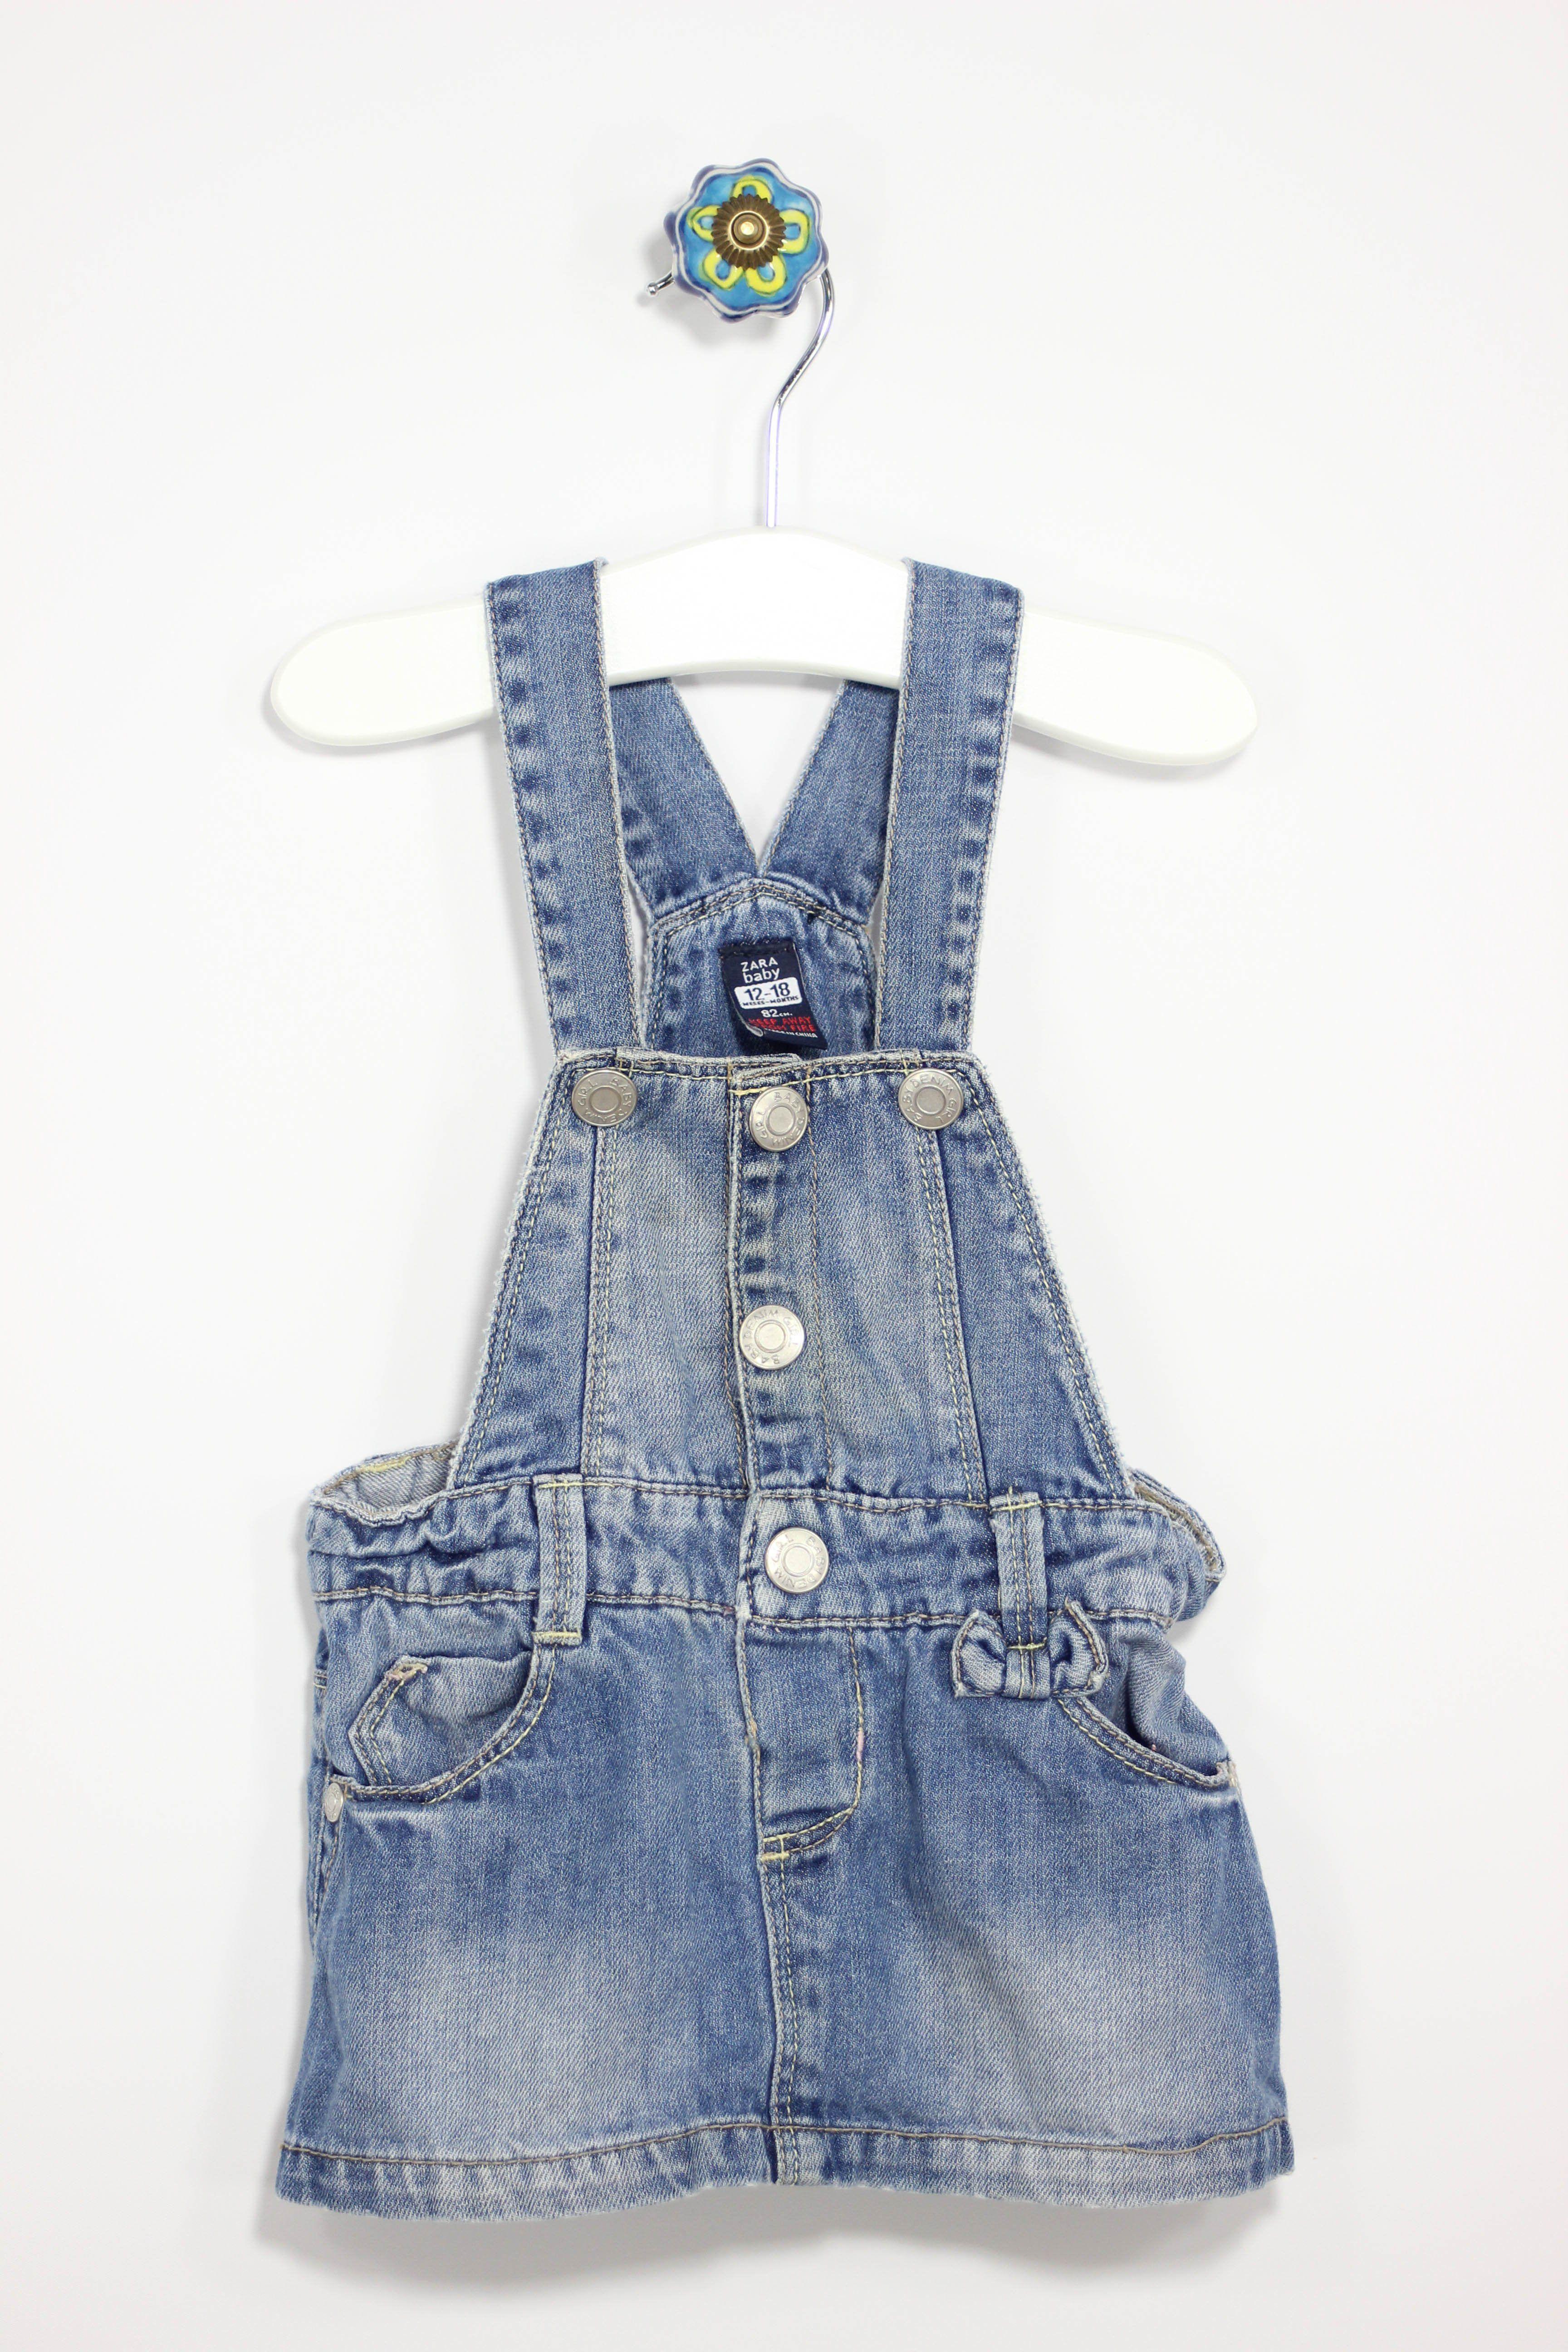 5c5cf0d3e9 Zara Baby Size 12-18M Skirt Overall